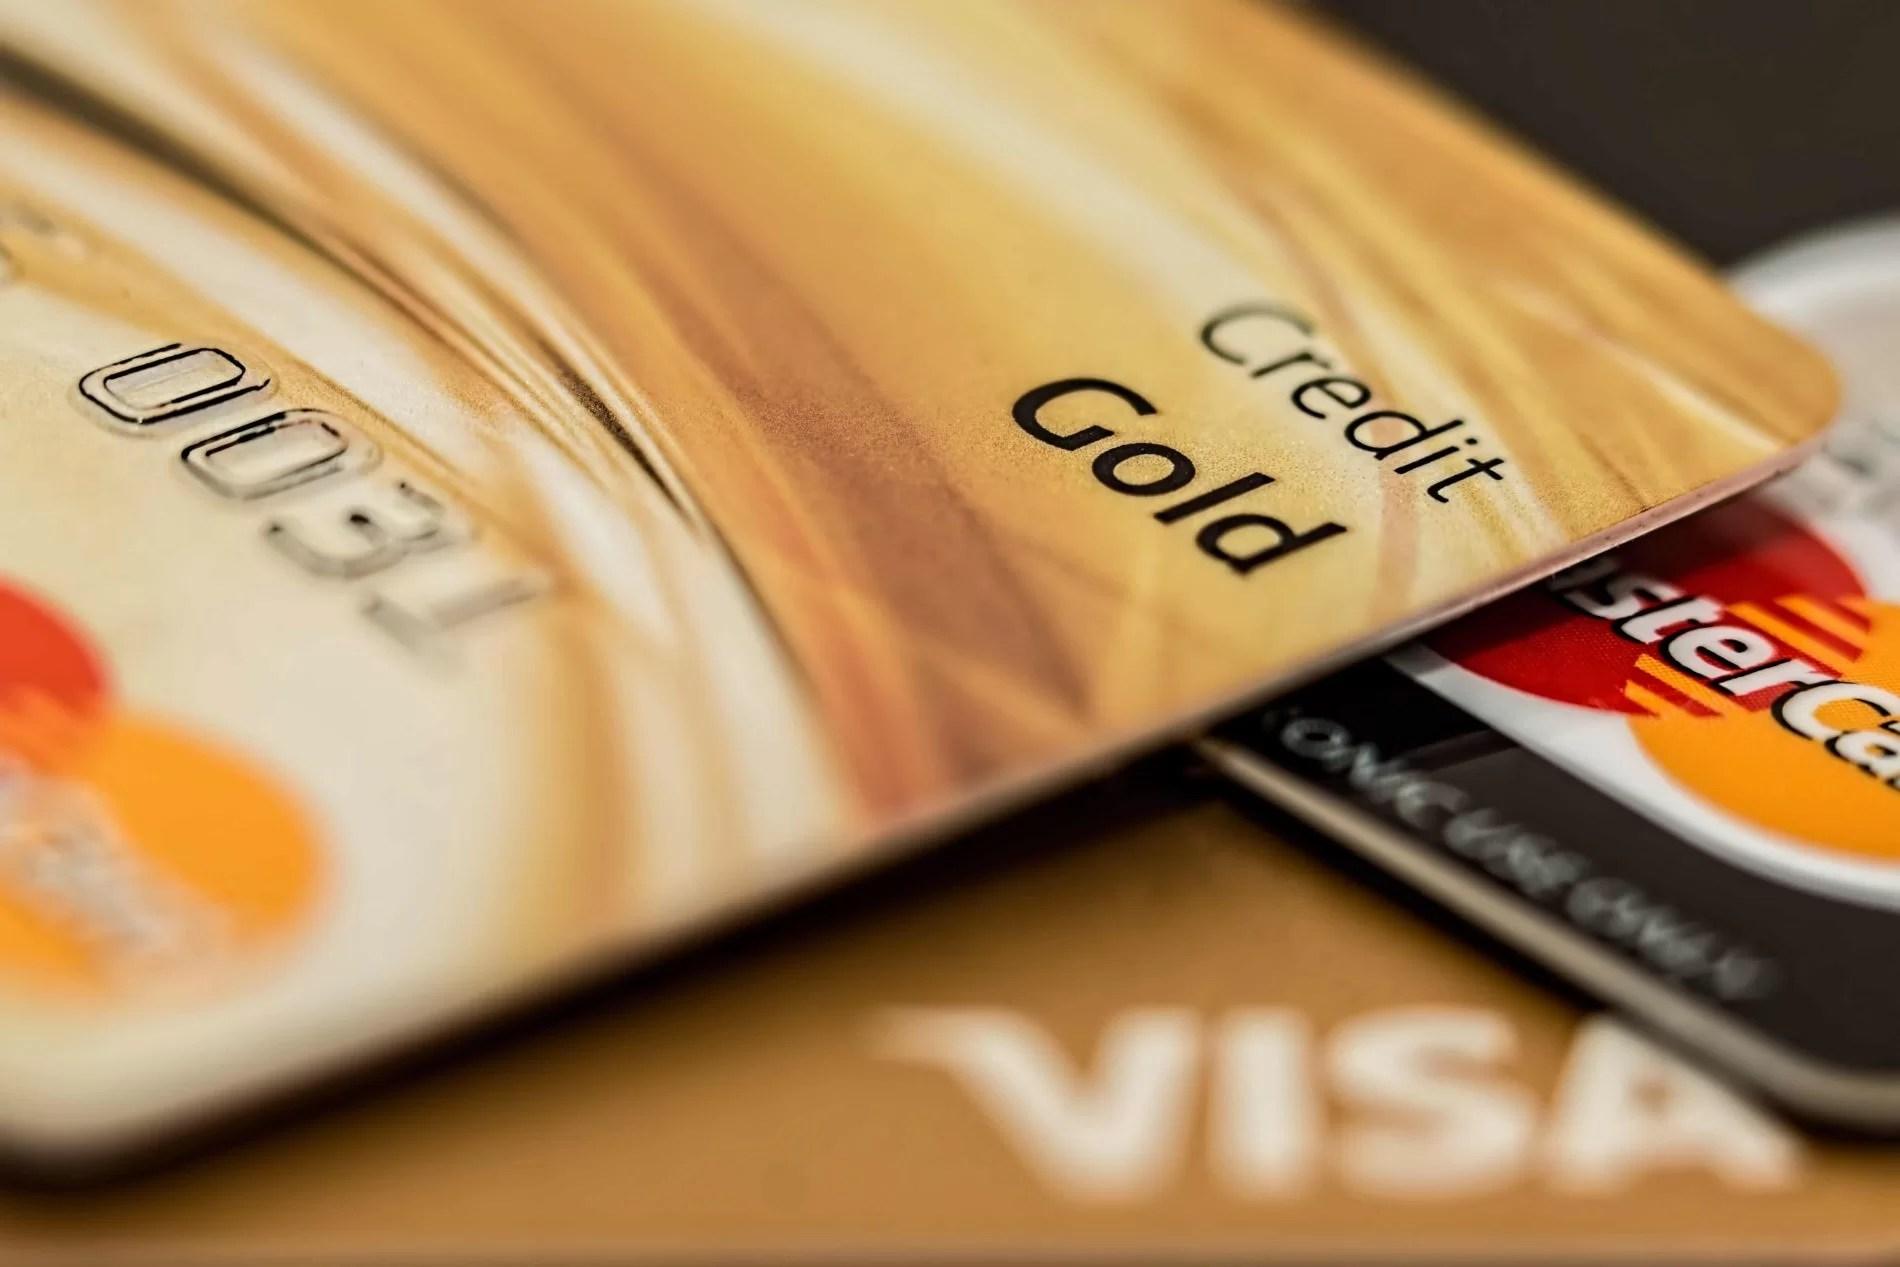 Get a travel rewards credit card.